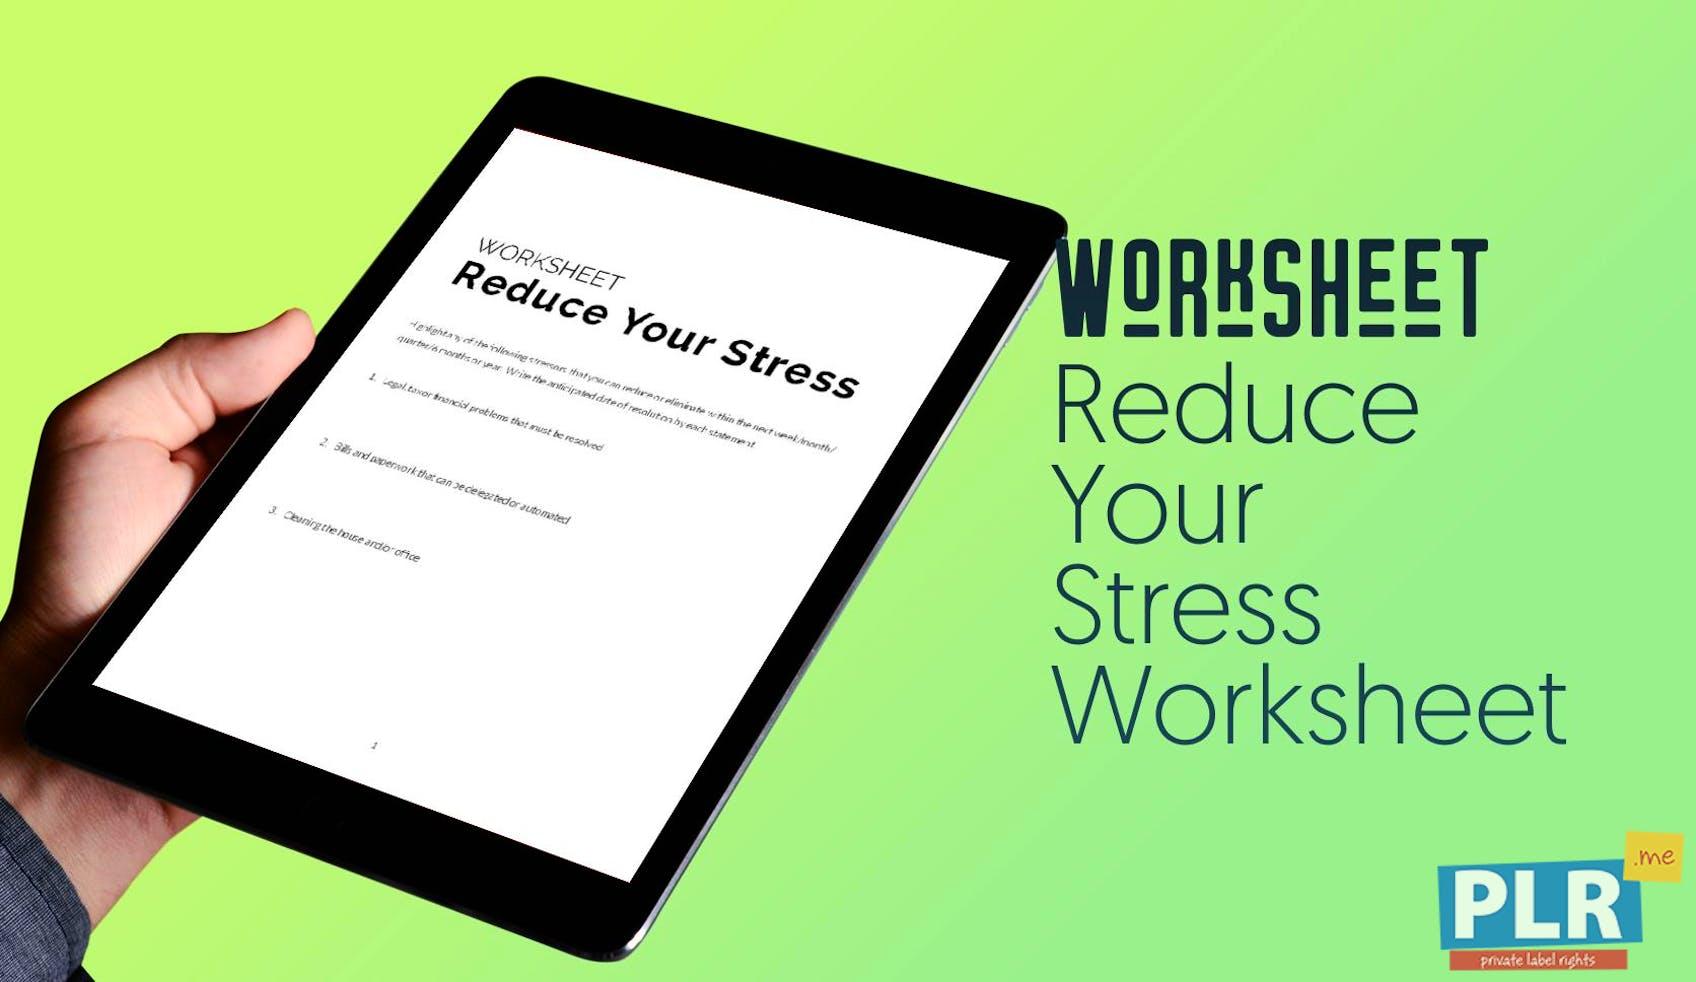 Reduce Your Stress Worksheet